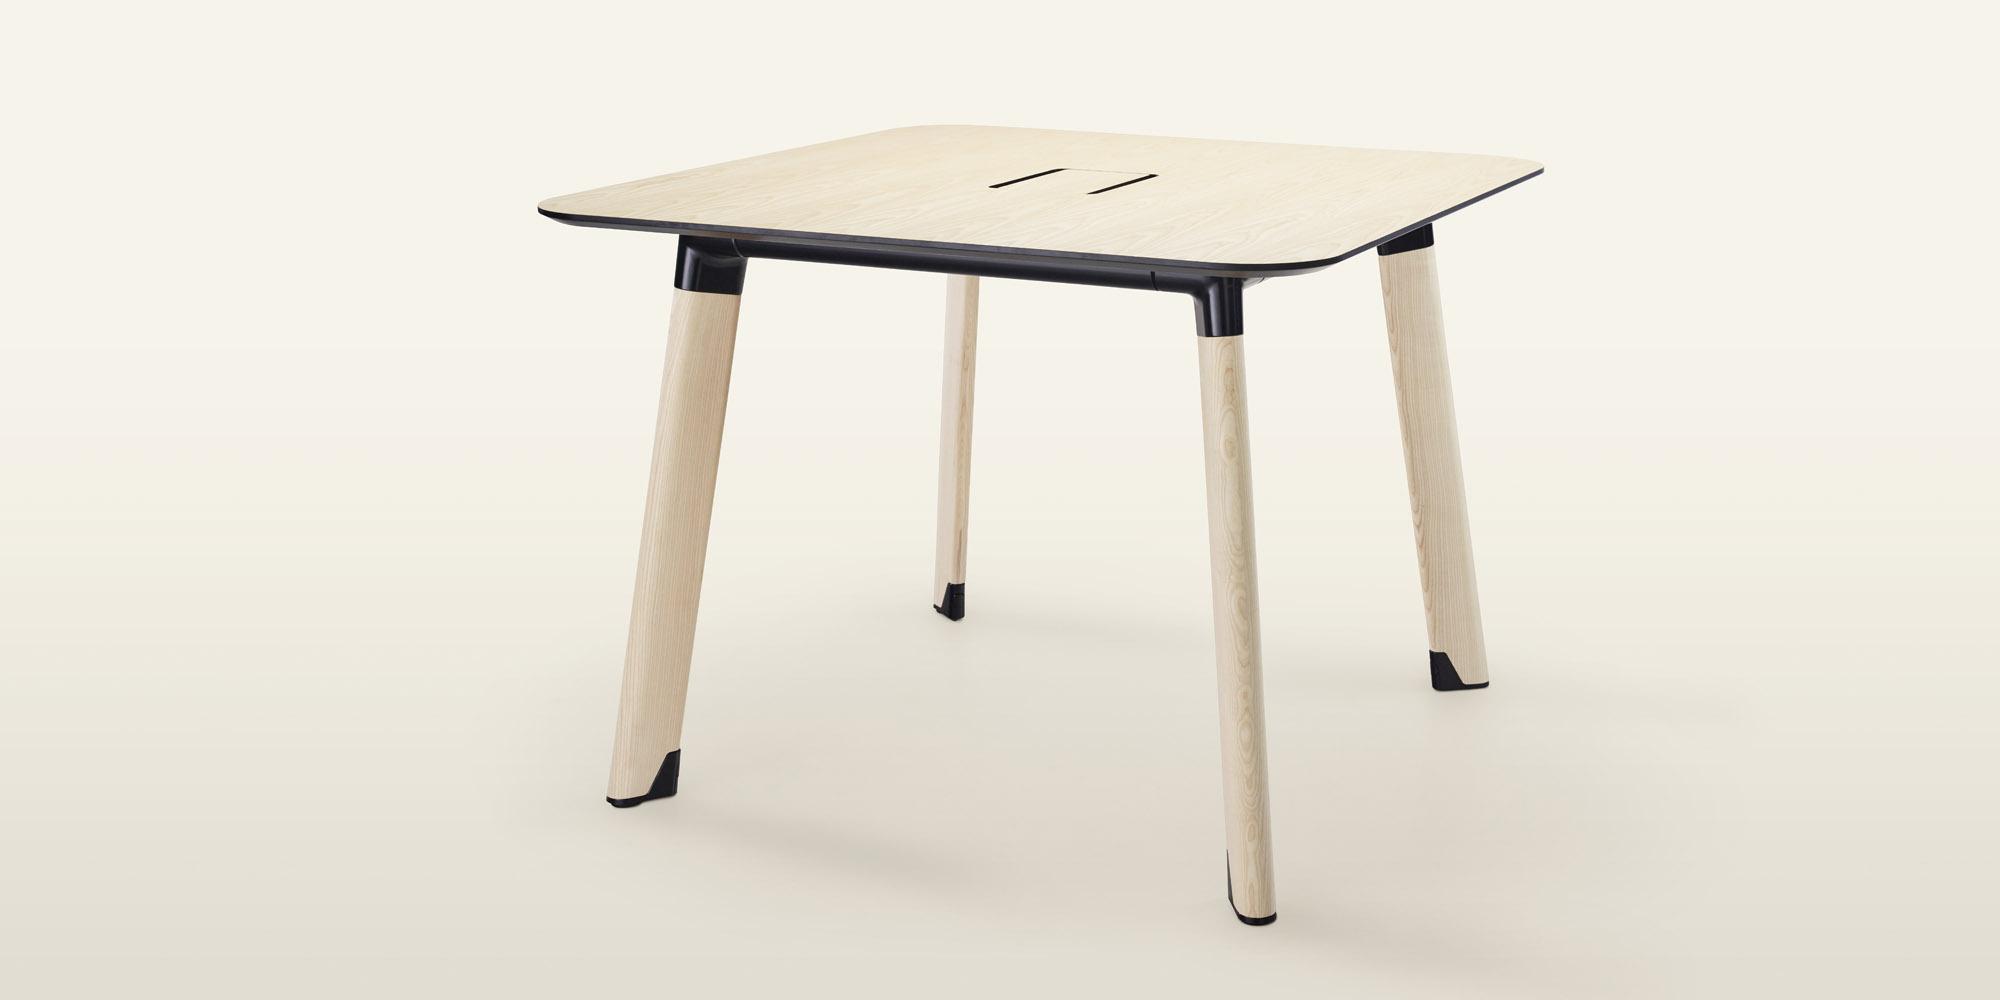 Jones-and-Partners-Diva-office-furniture-8.jpg